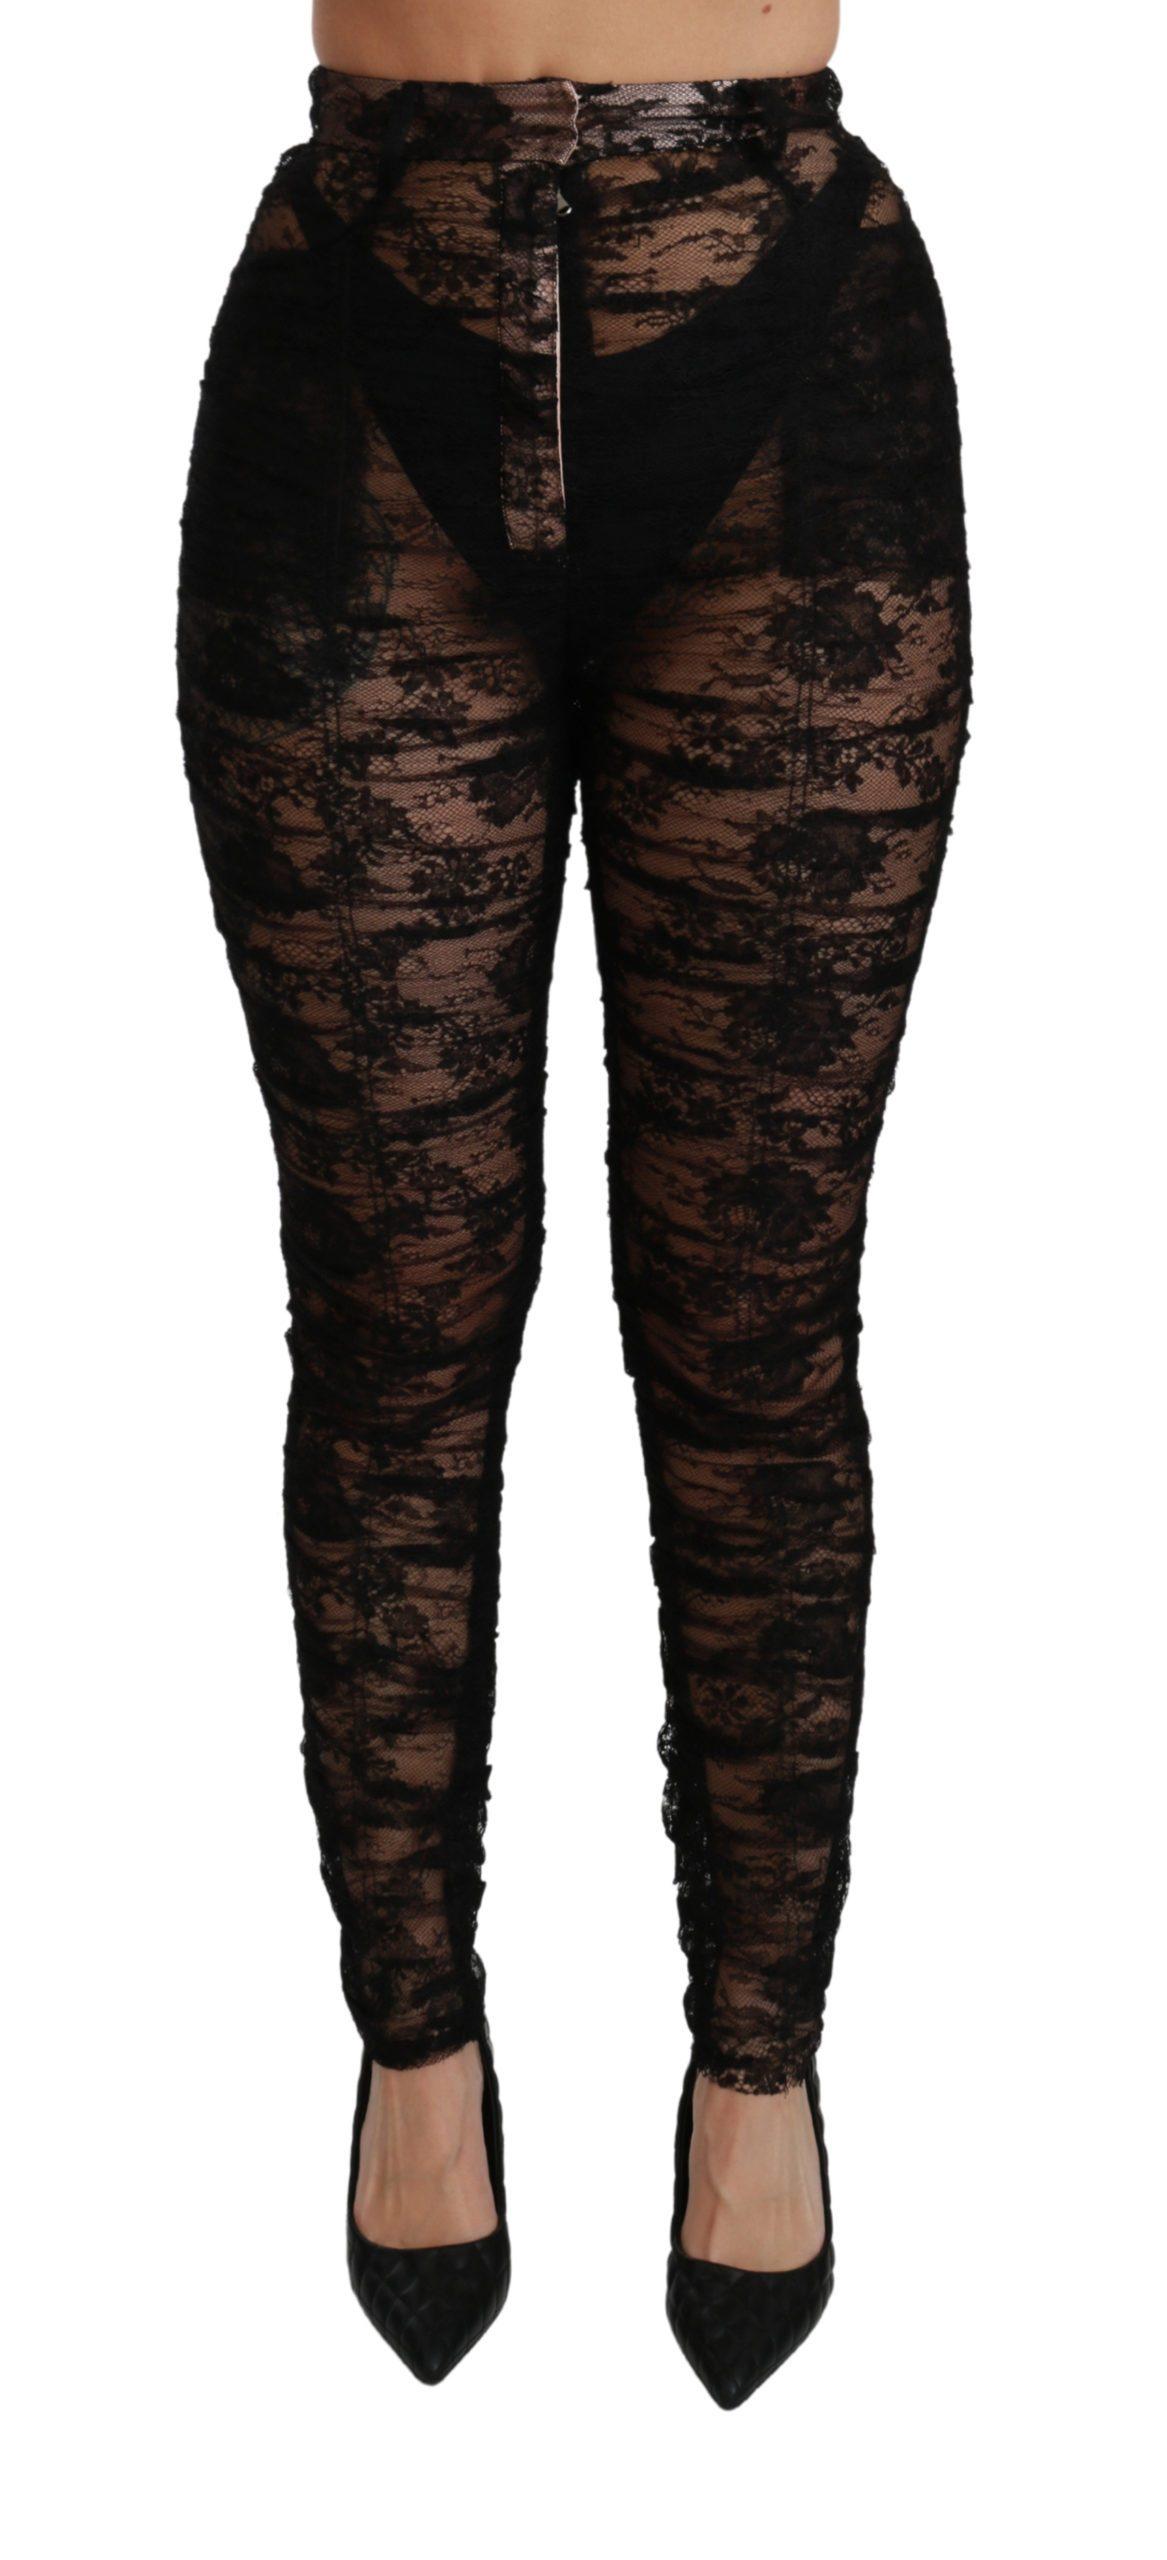 Black Lace High Waist Skinny Trouser Pants - IT40 S